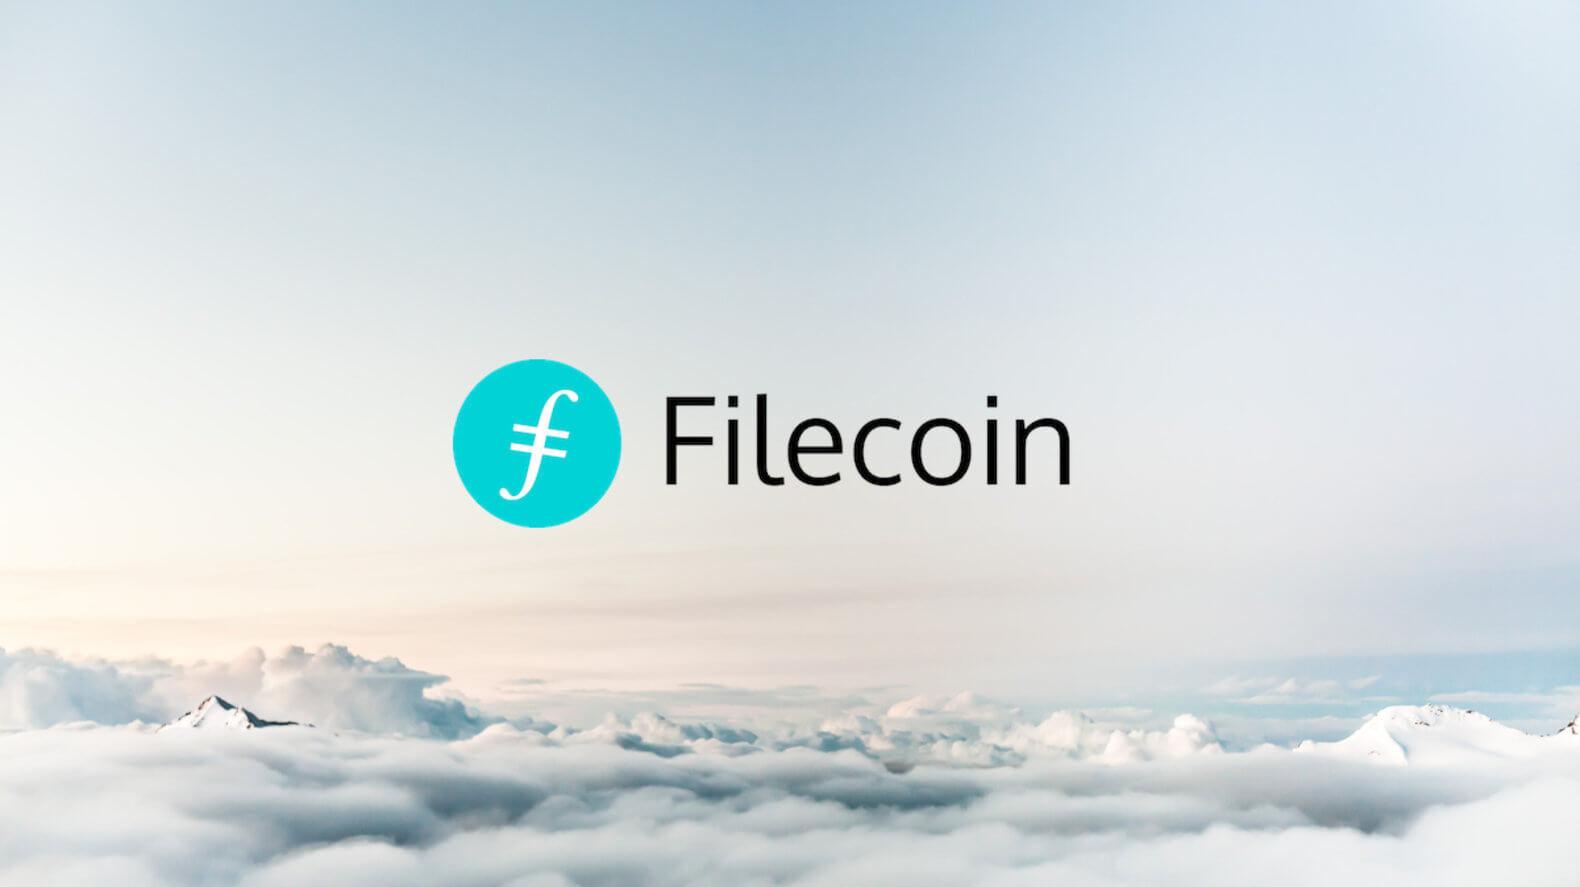 filecoin挖矿收益如何计算?最新的filecoin挖矿教程?